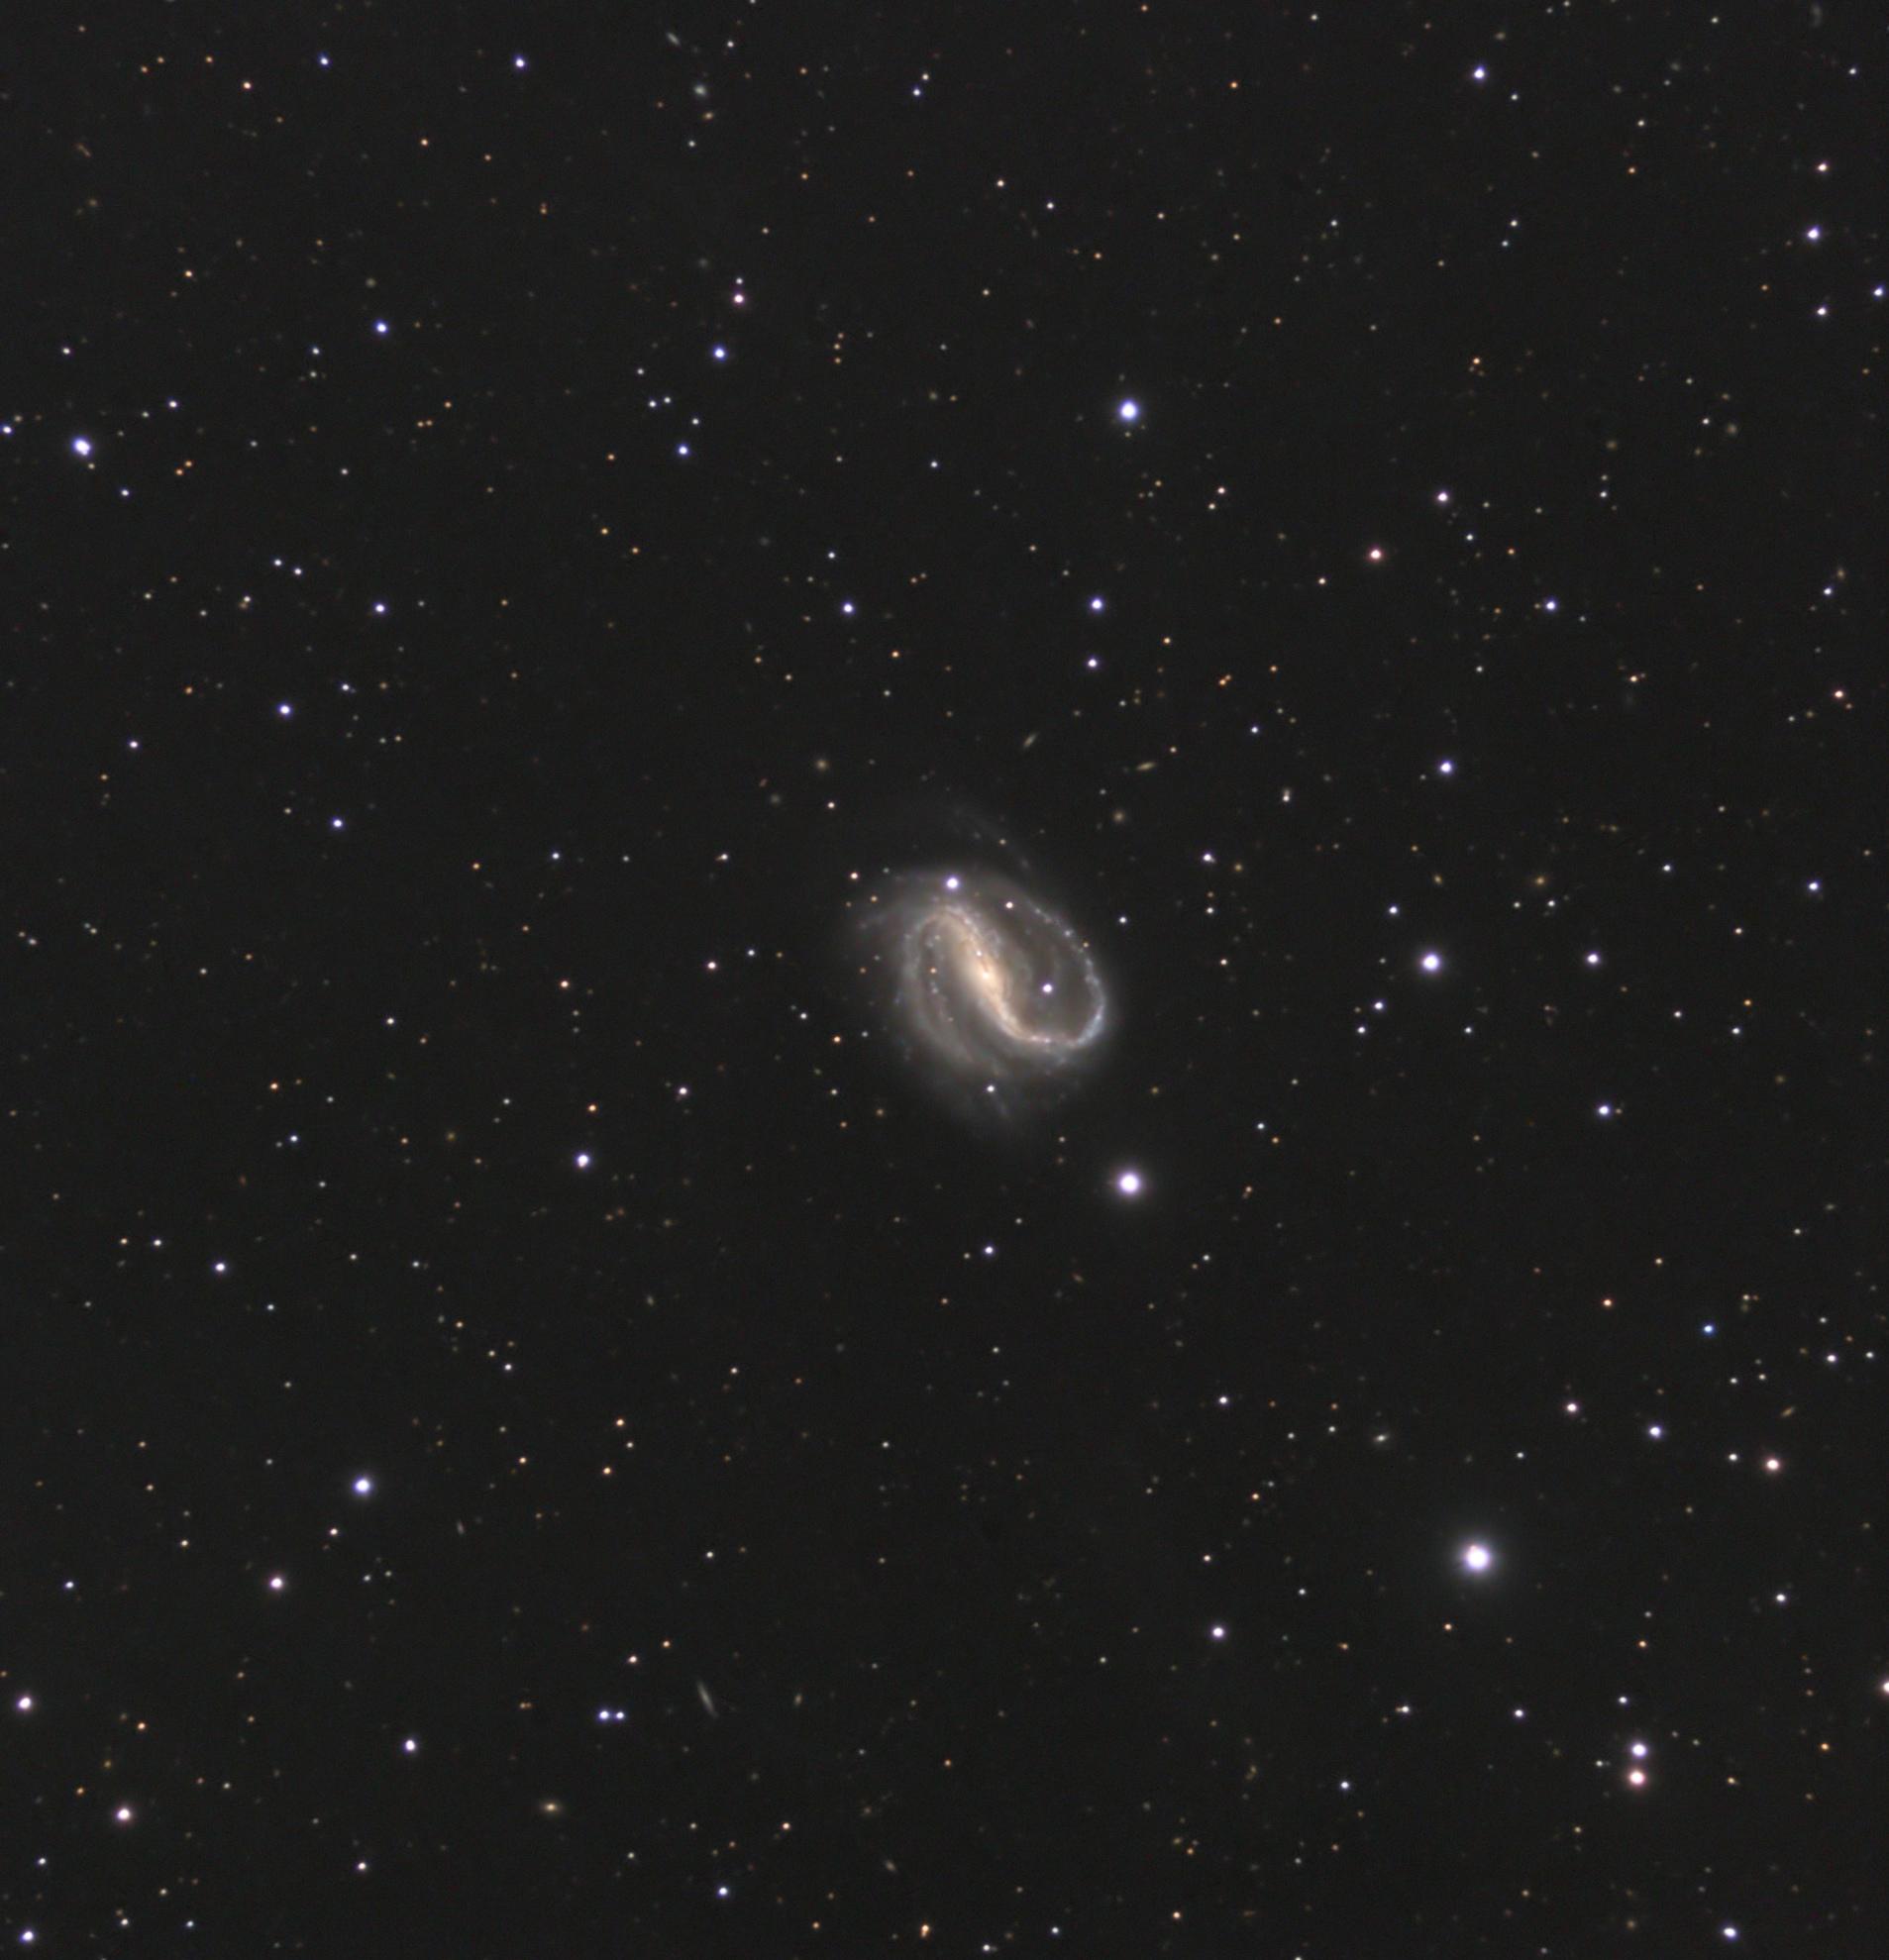 NGC7479.jpg.547b0bf46035380cbf60cc35ed67db89.jpg